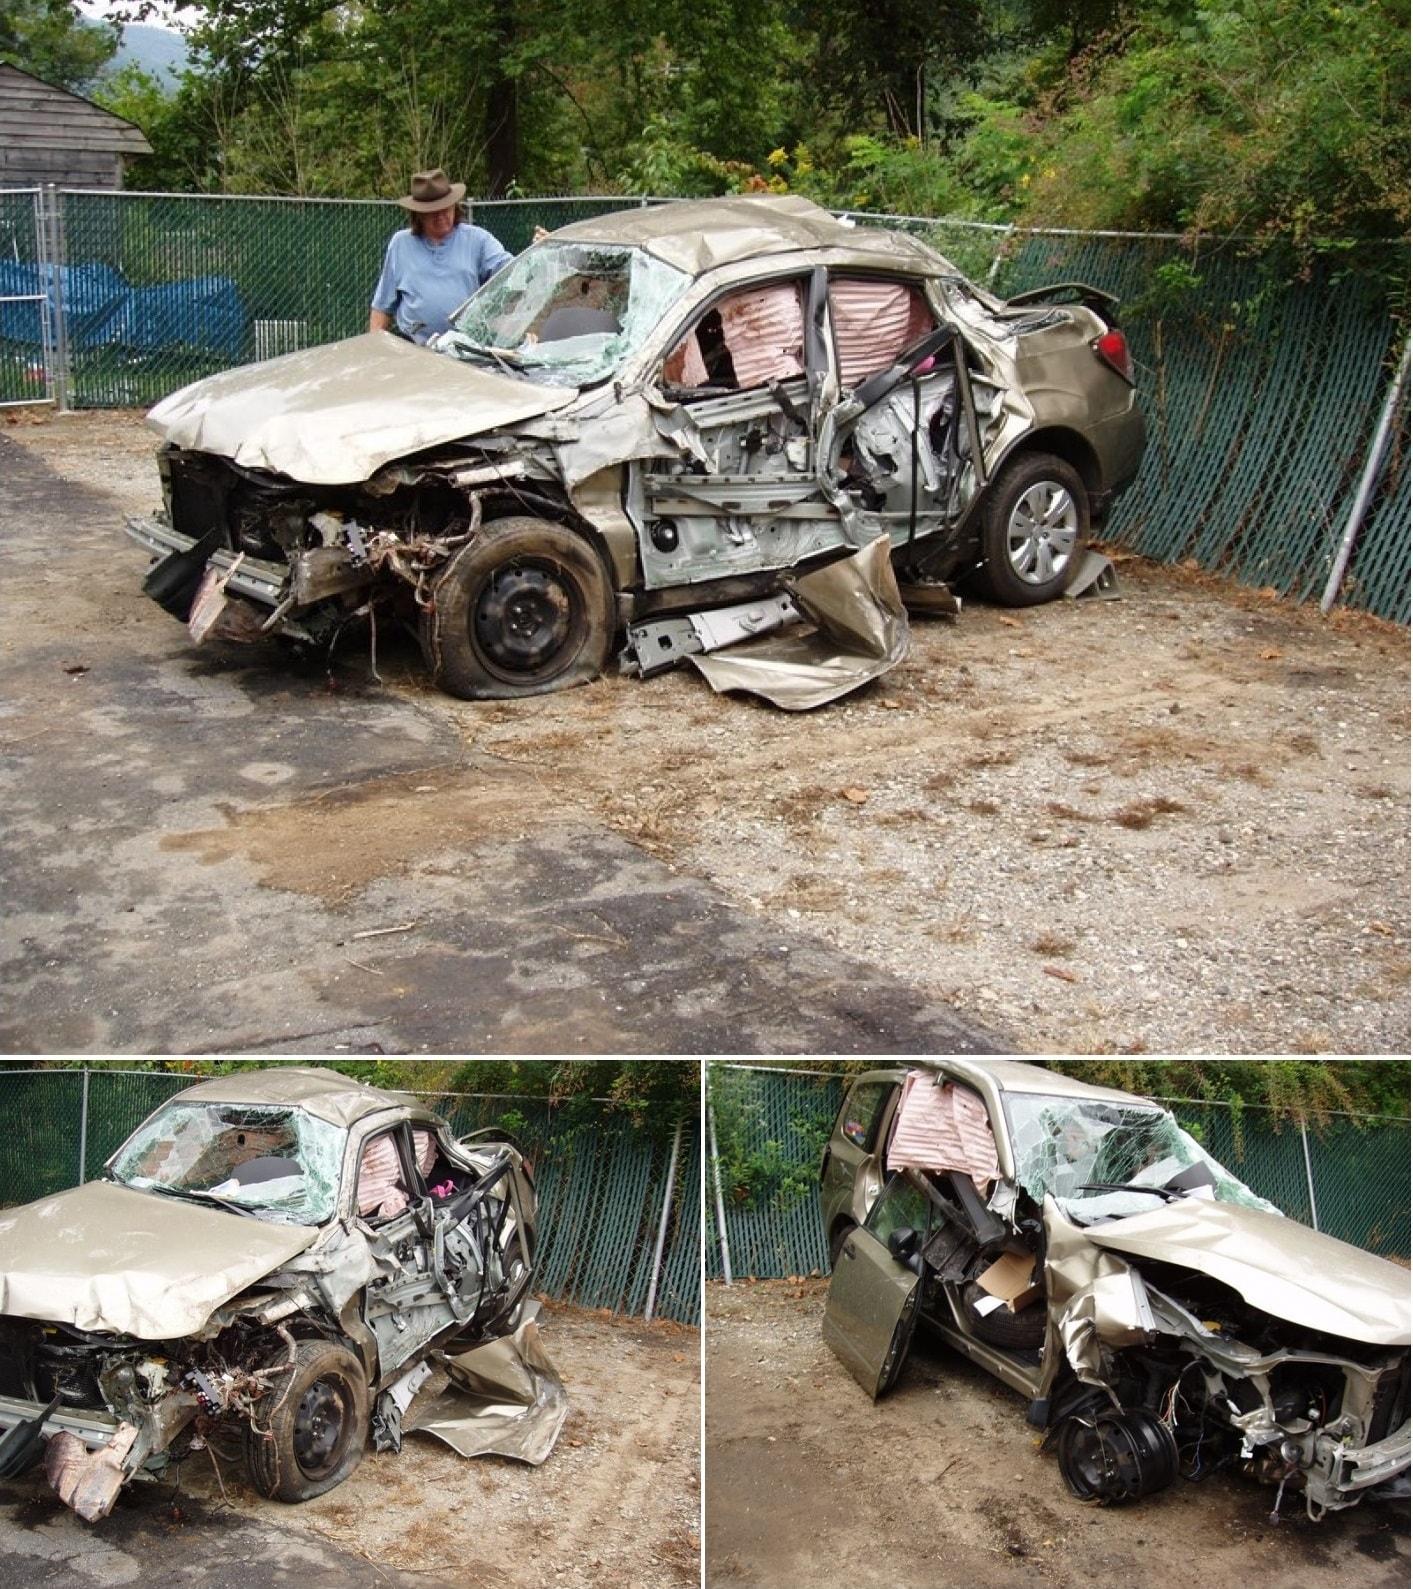 New Subaru Dealership In Asheville, NC 28805